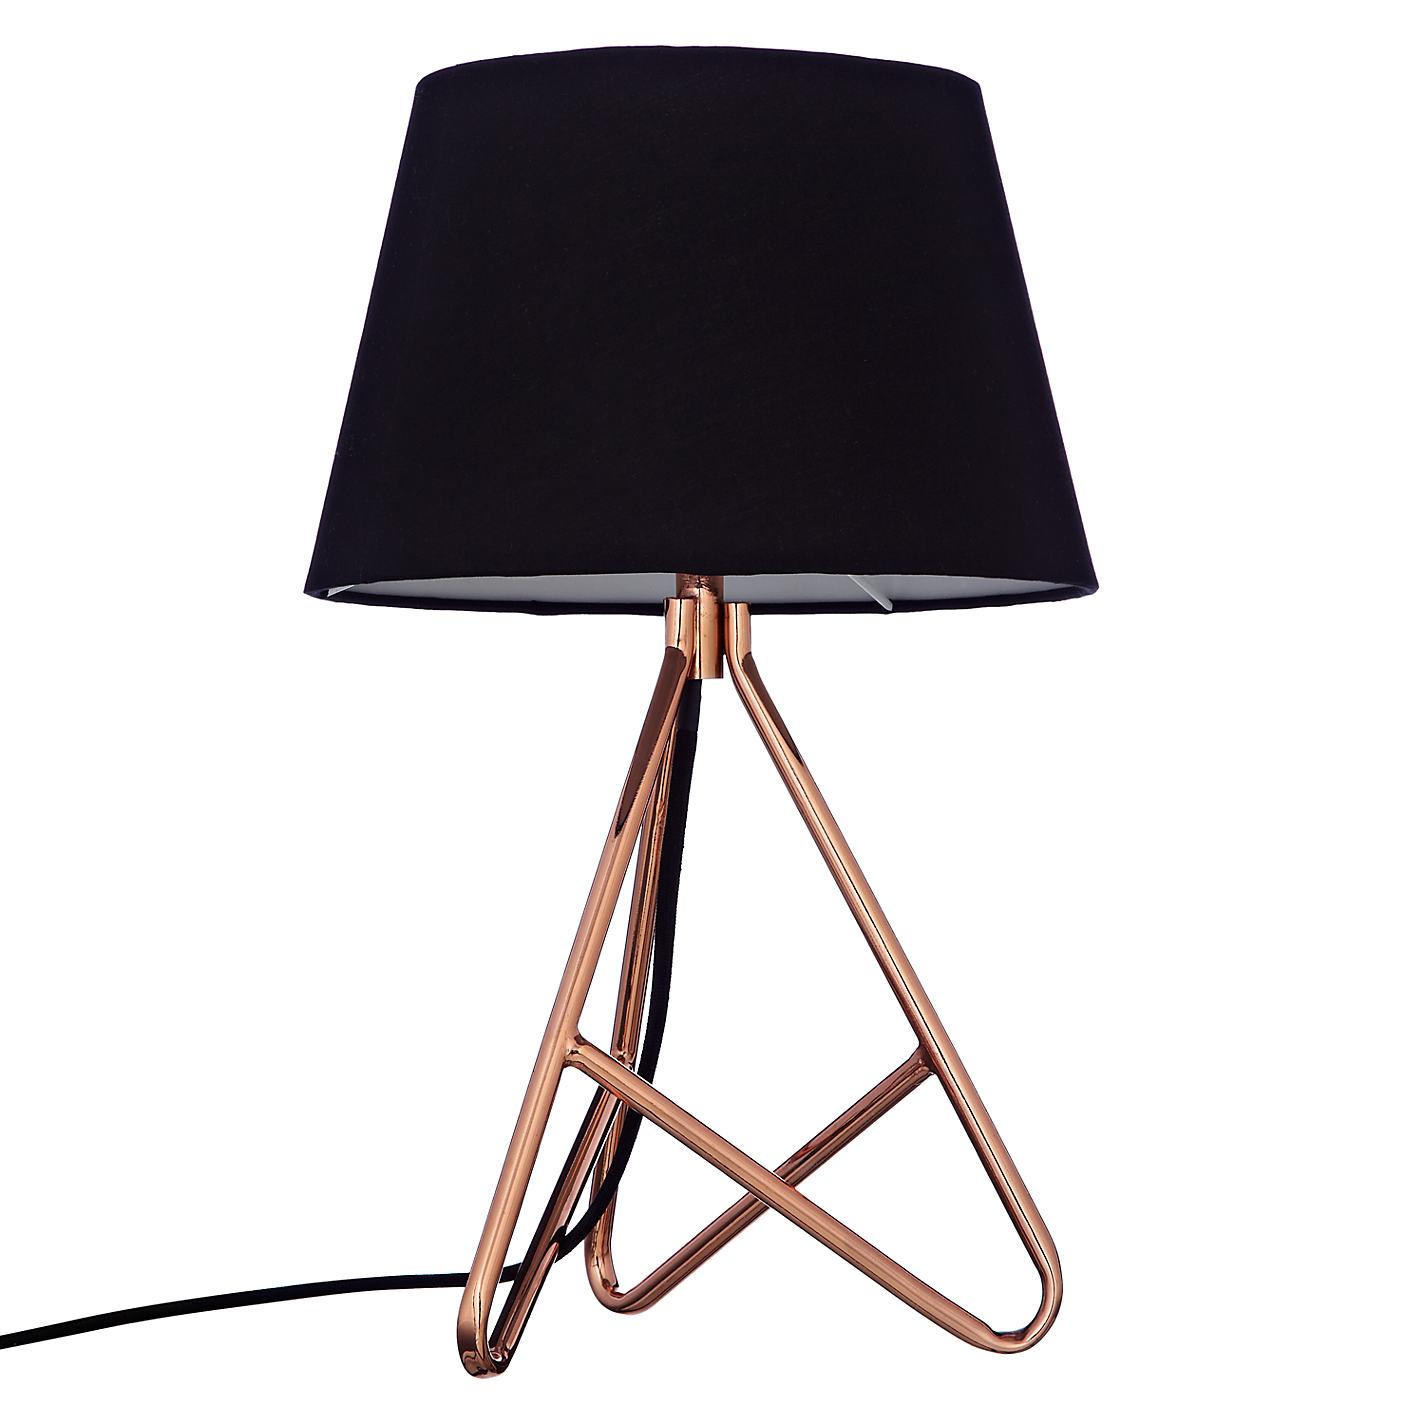 Copper lampcopper vintage spotlight floor lamp with for Copper floor lamp john lewis